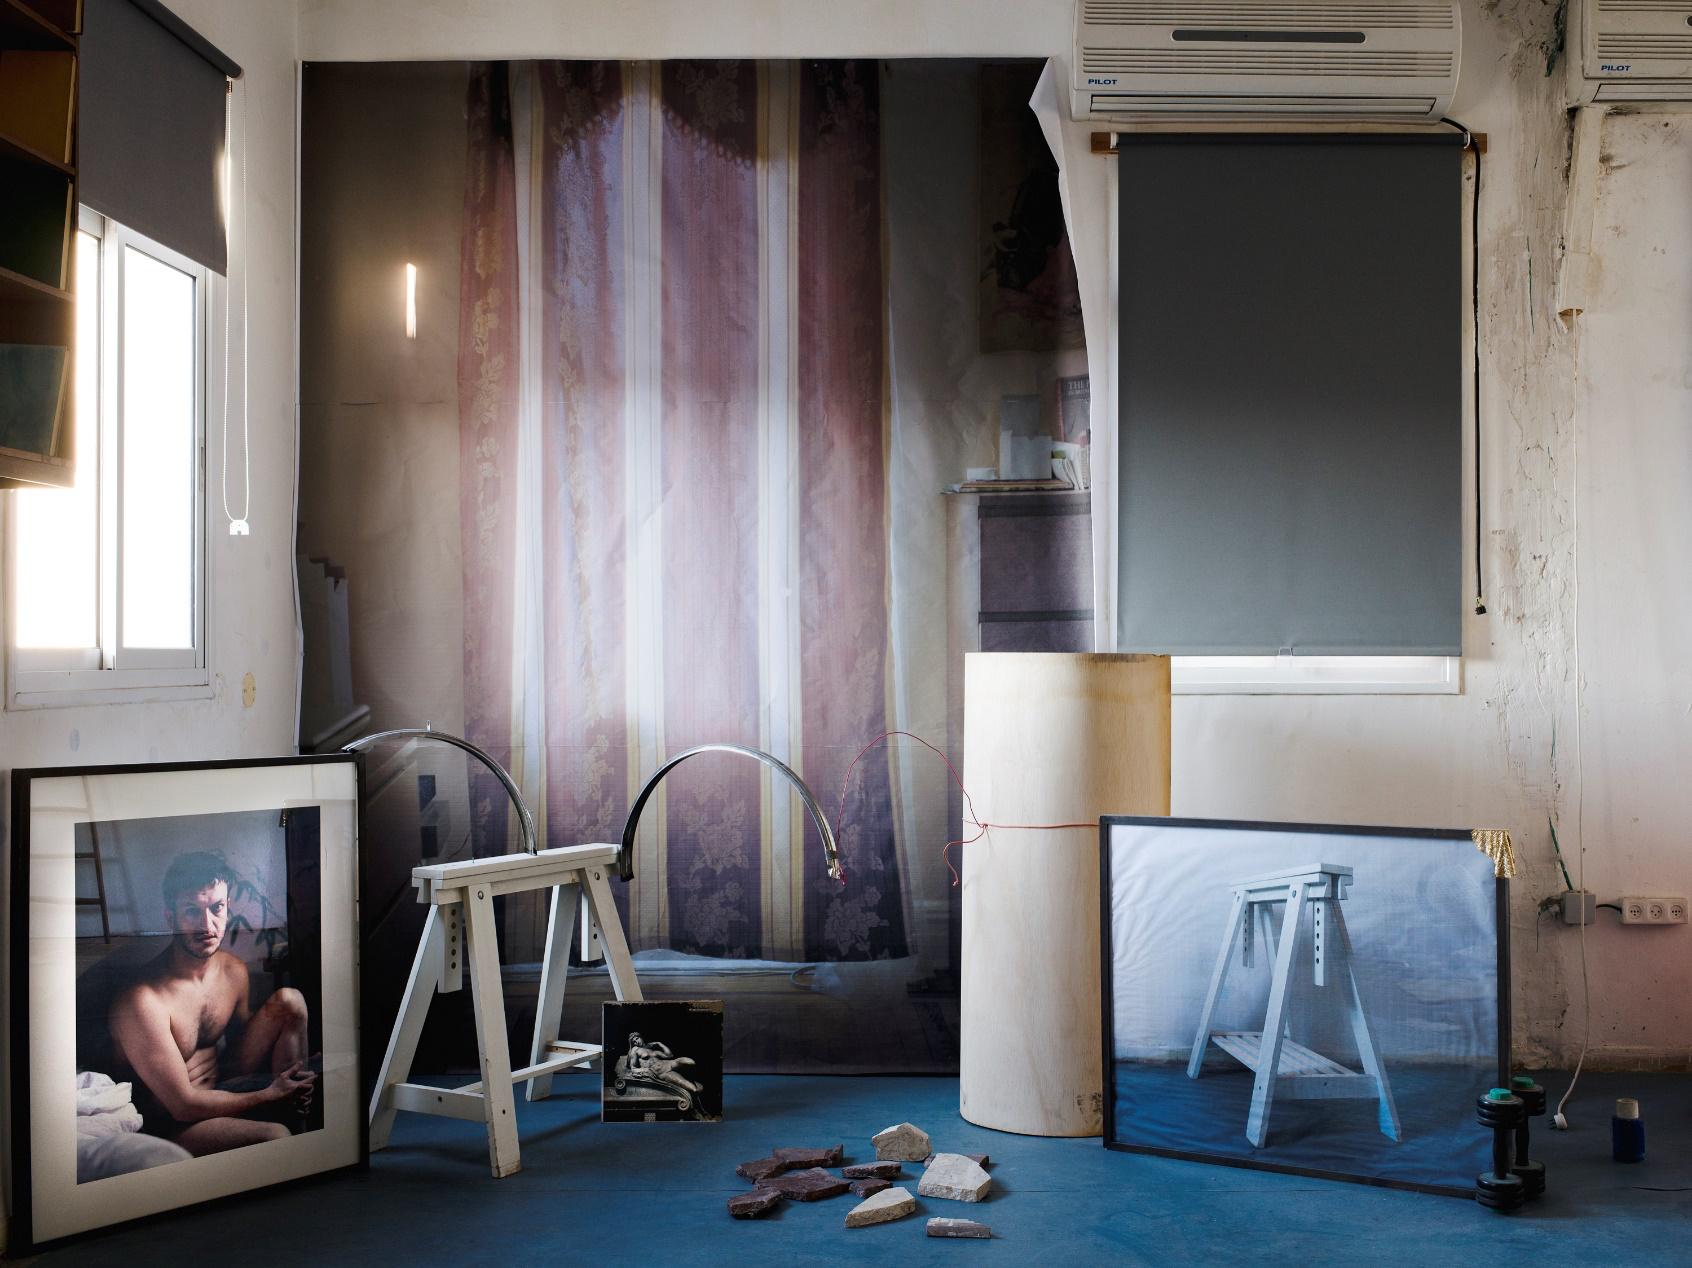 Mark Yashaev, Untitled, 2017, inkjet print, 150 x 200 cm